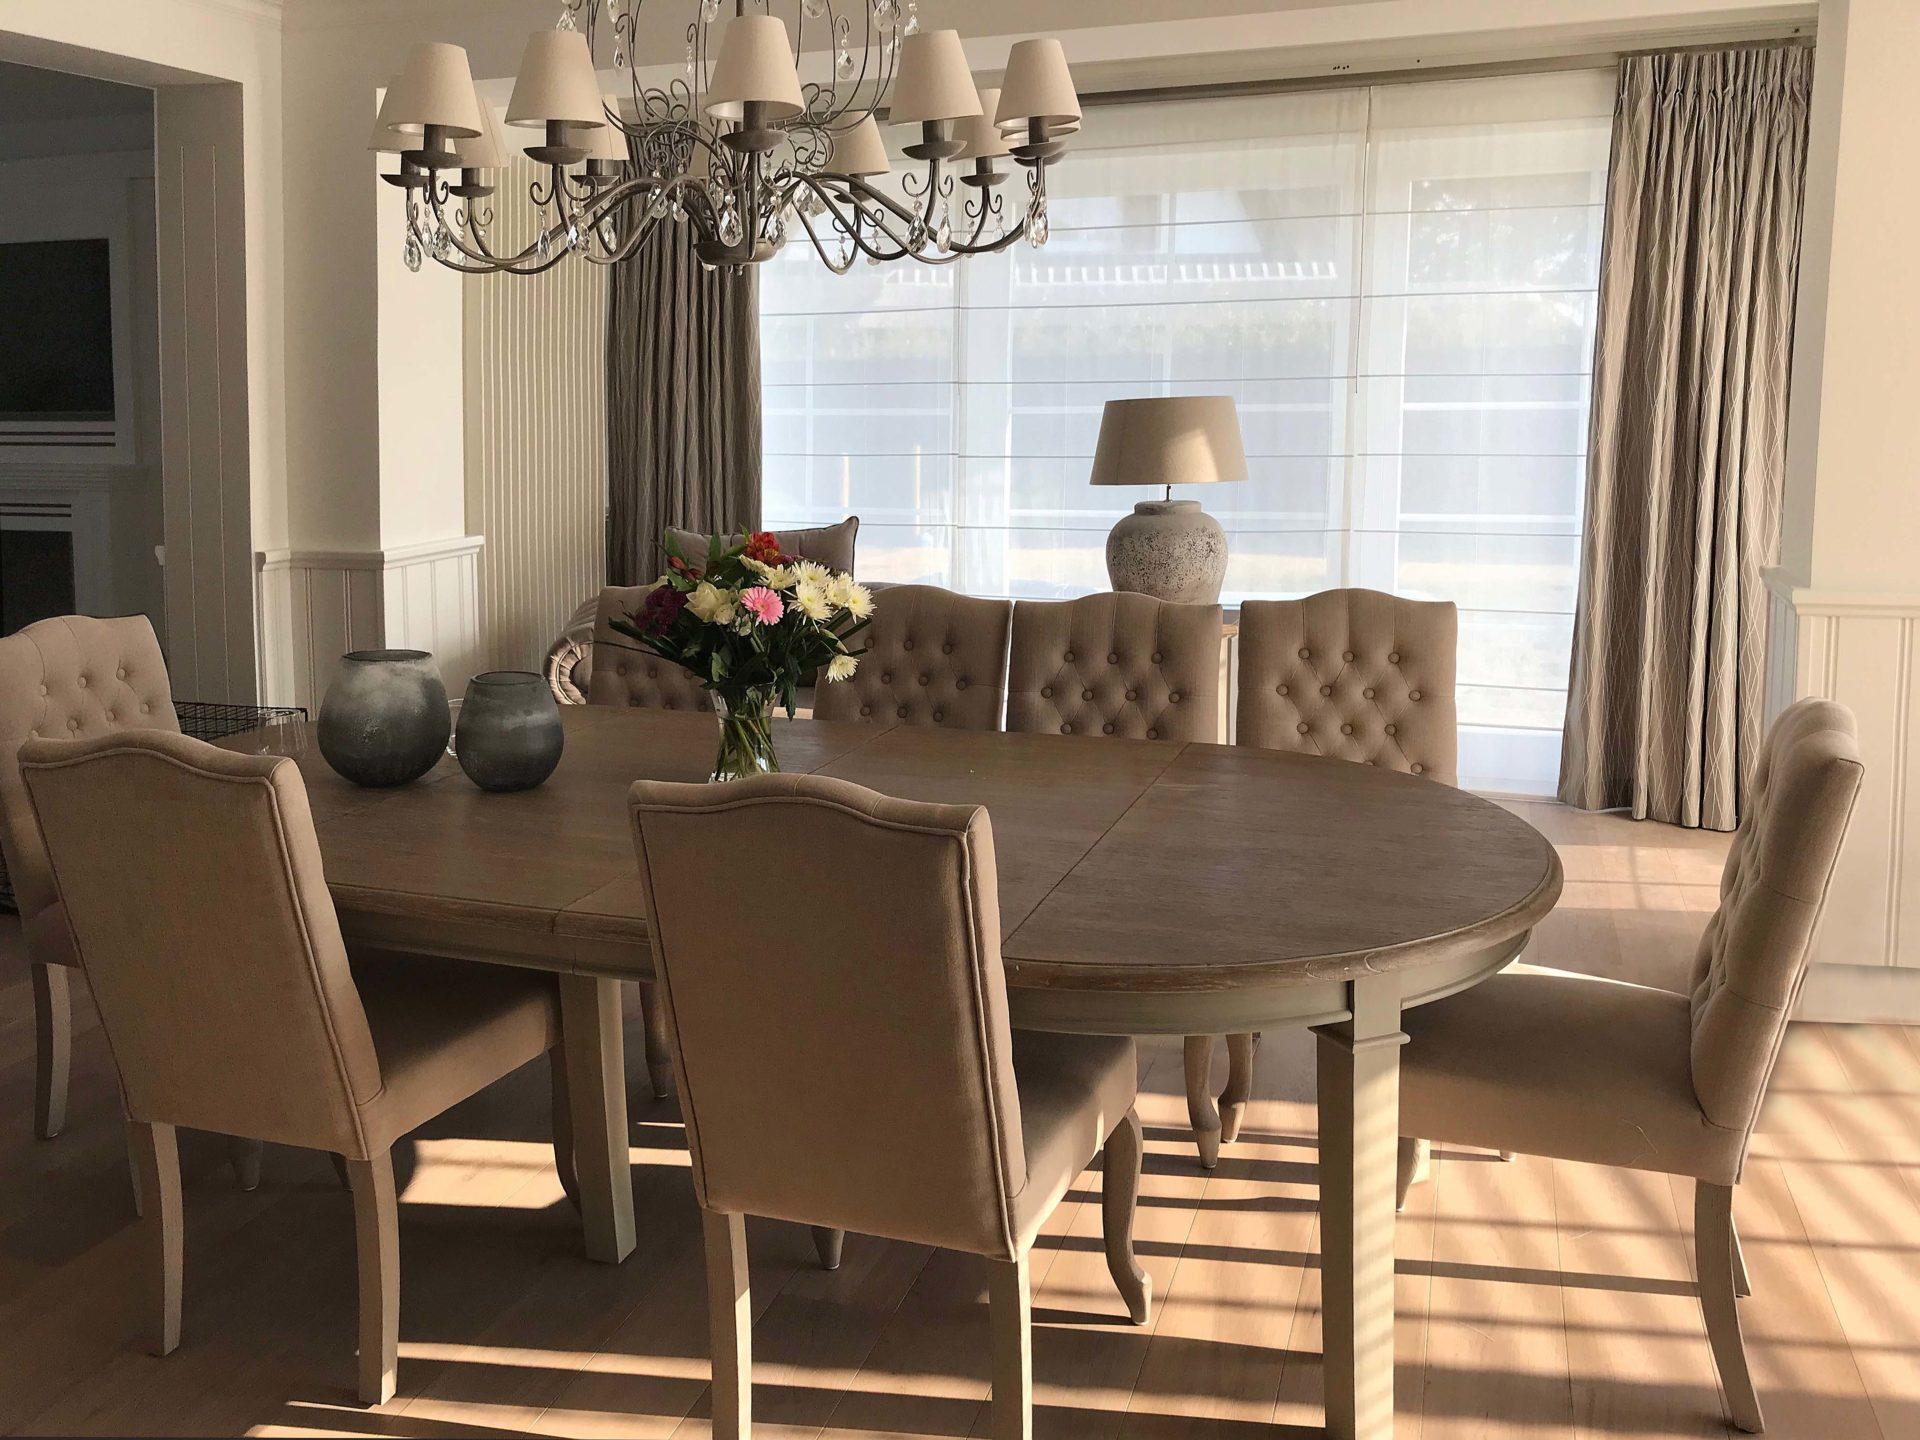 Cocoon Interieur - Marcotte Style